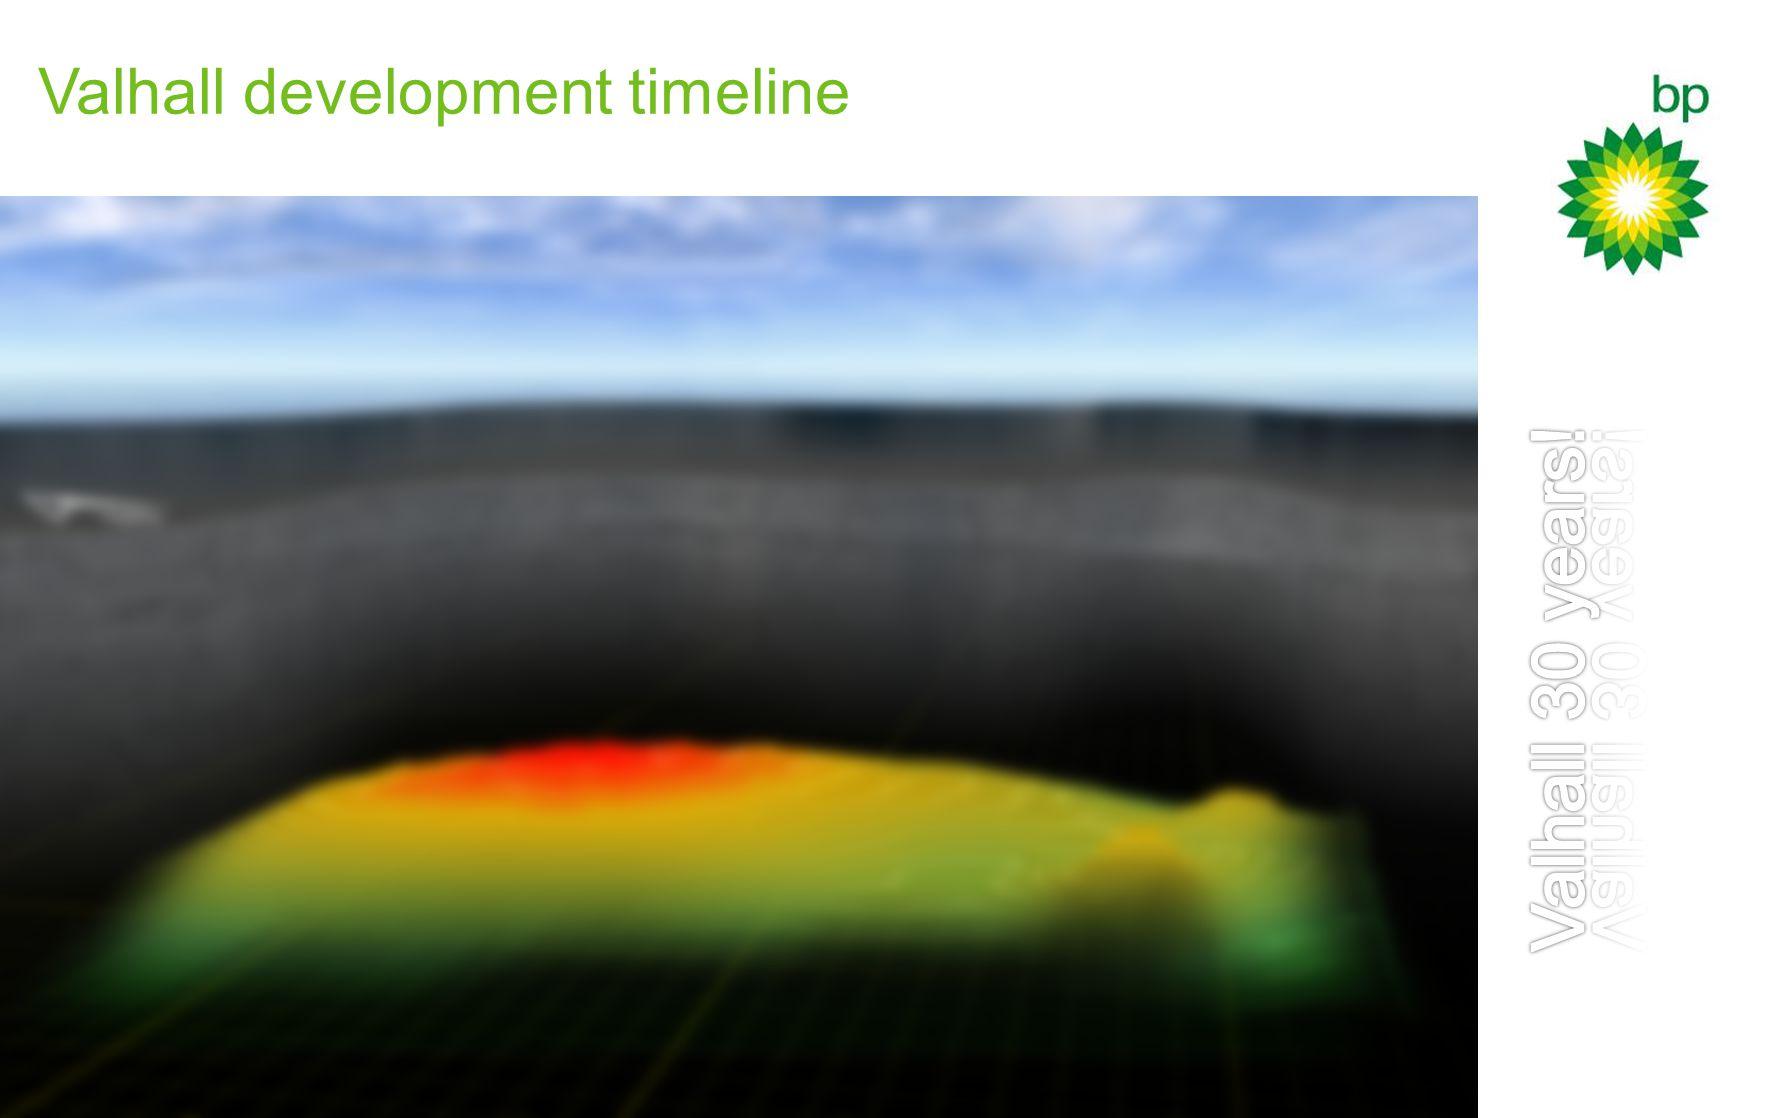 Valhall development timeline